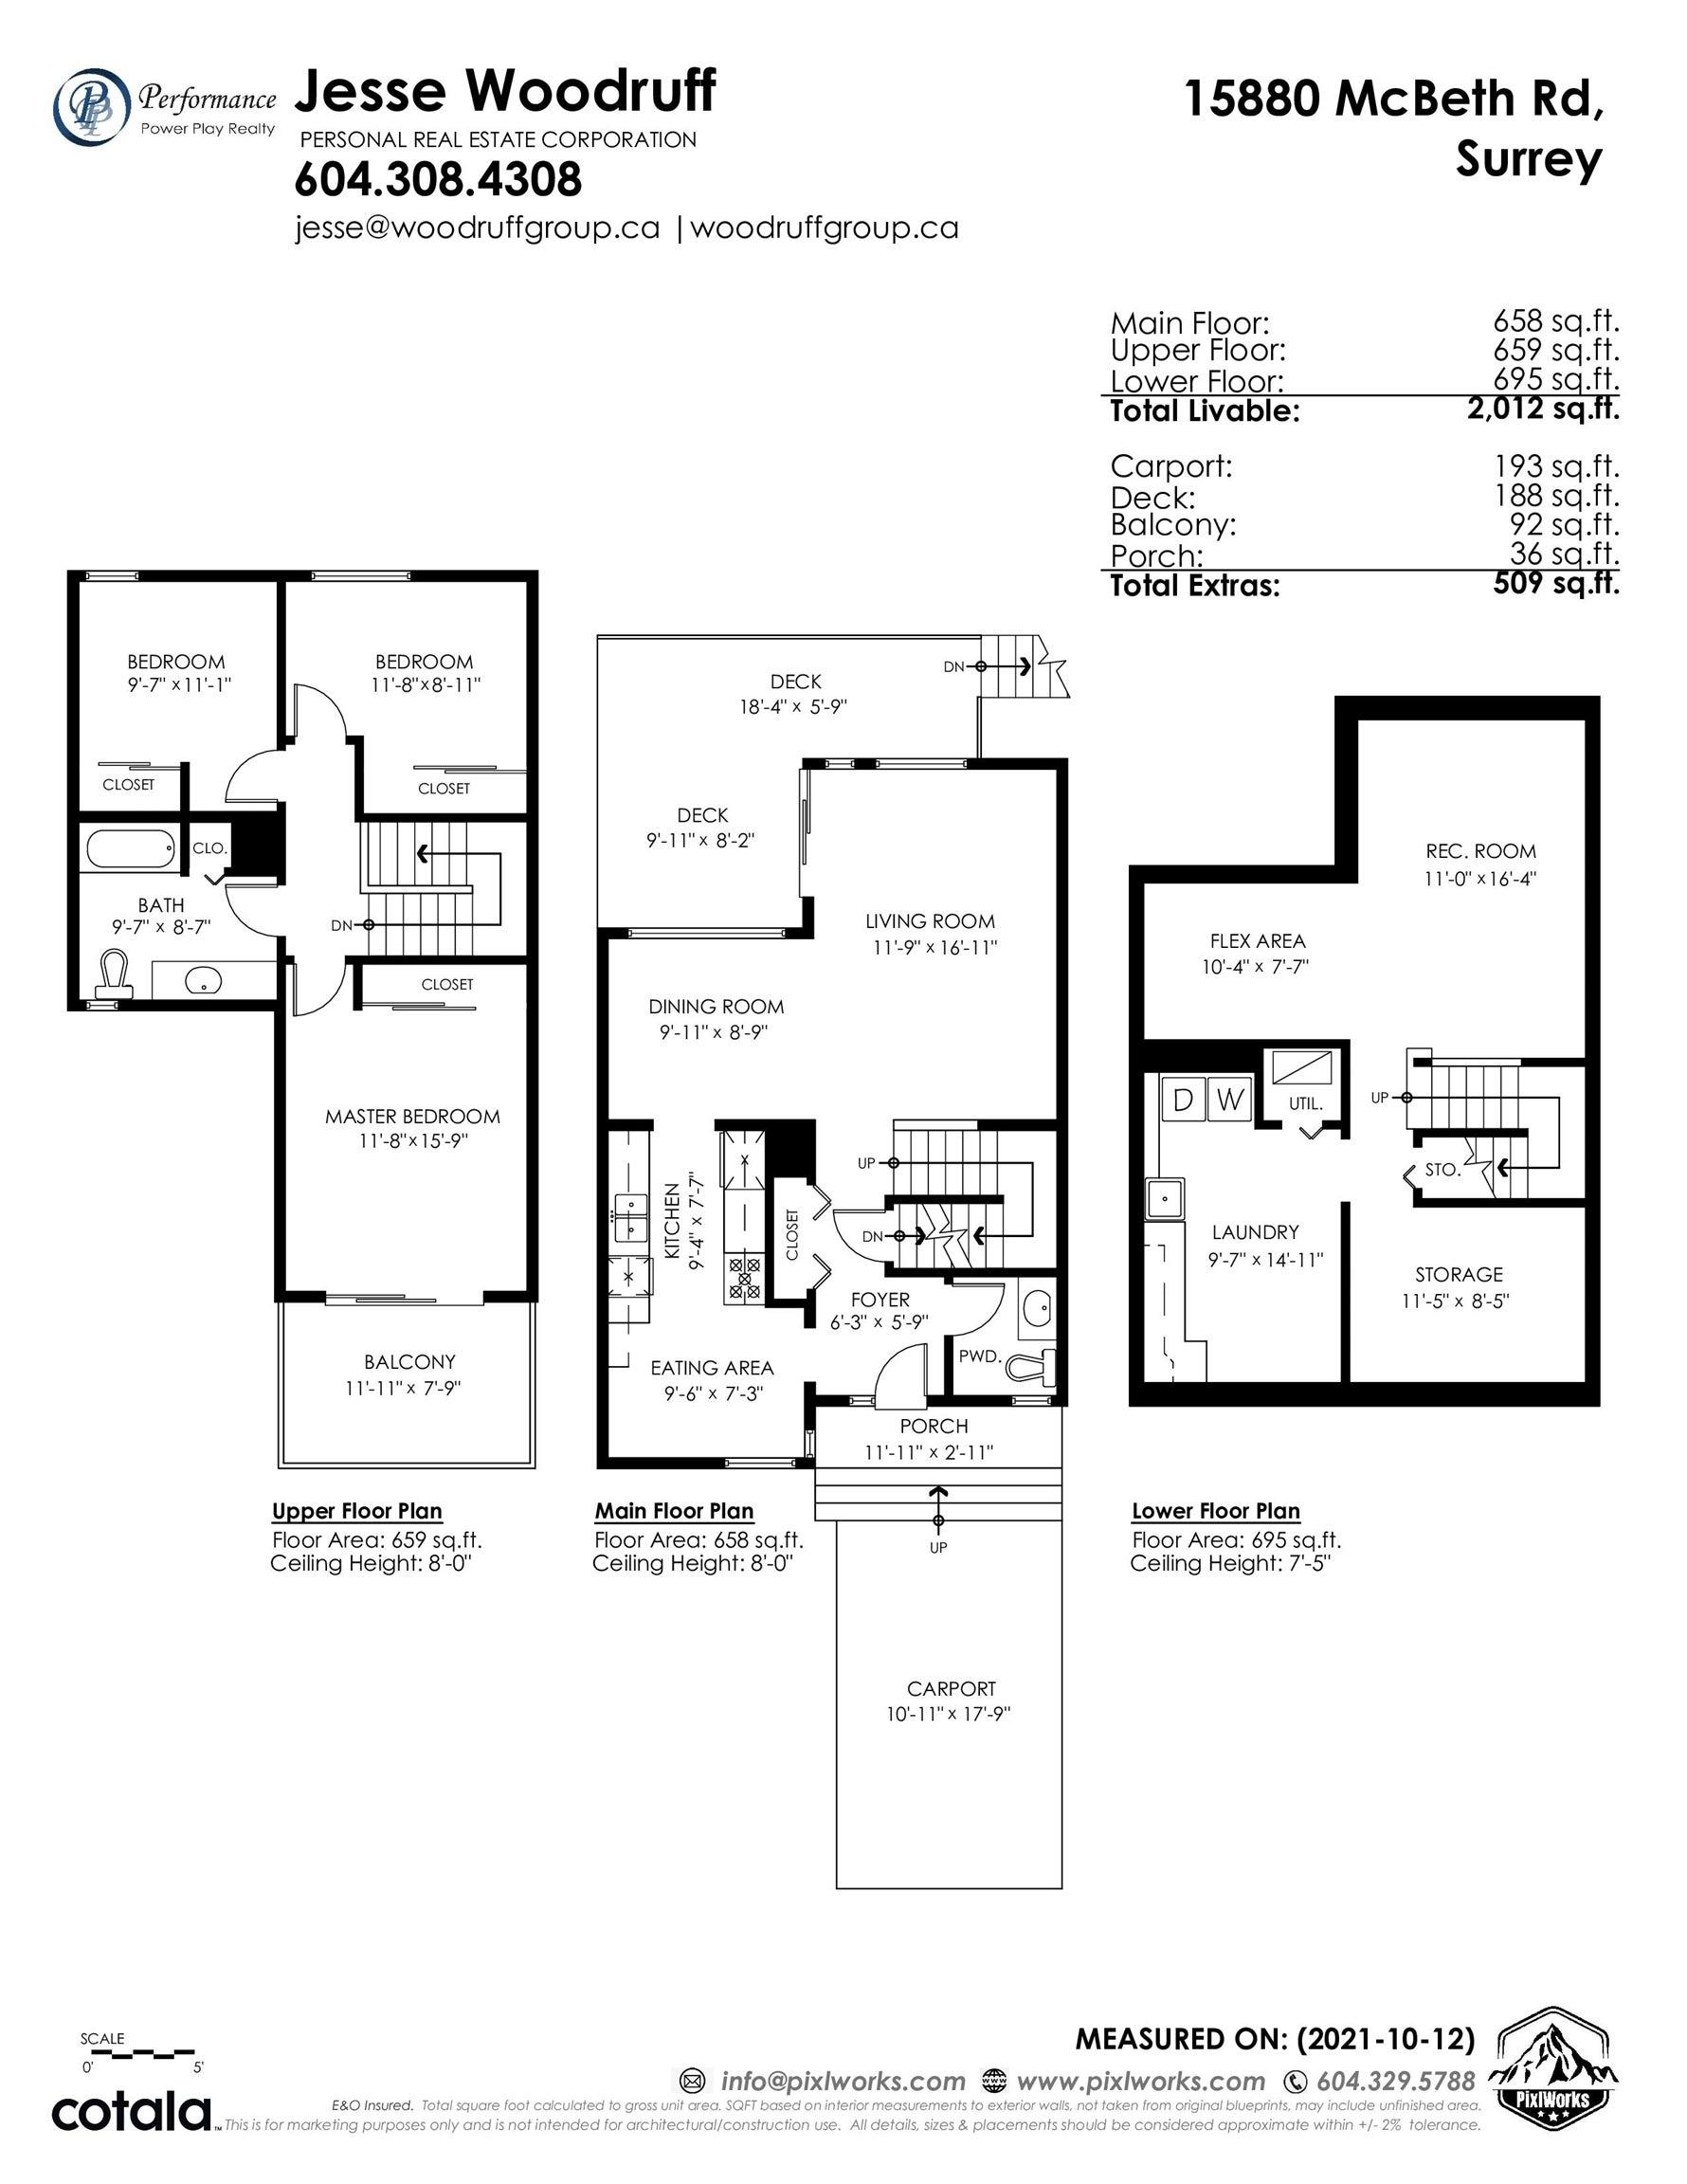 15880 MCBETH ROAD - King George Corridor Townhouse for sale, 3 Bedrooms (R2625450) - #39